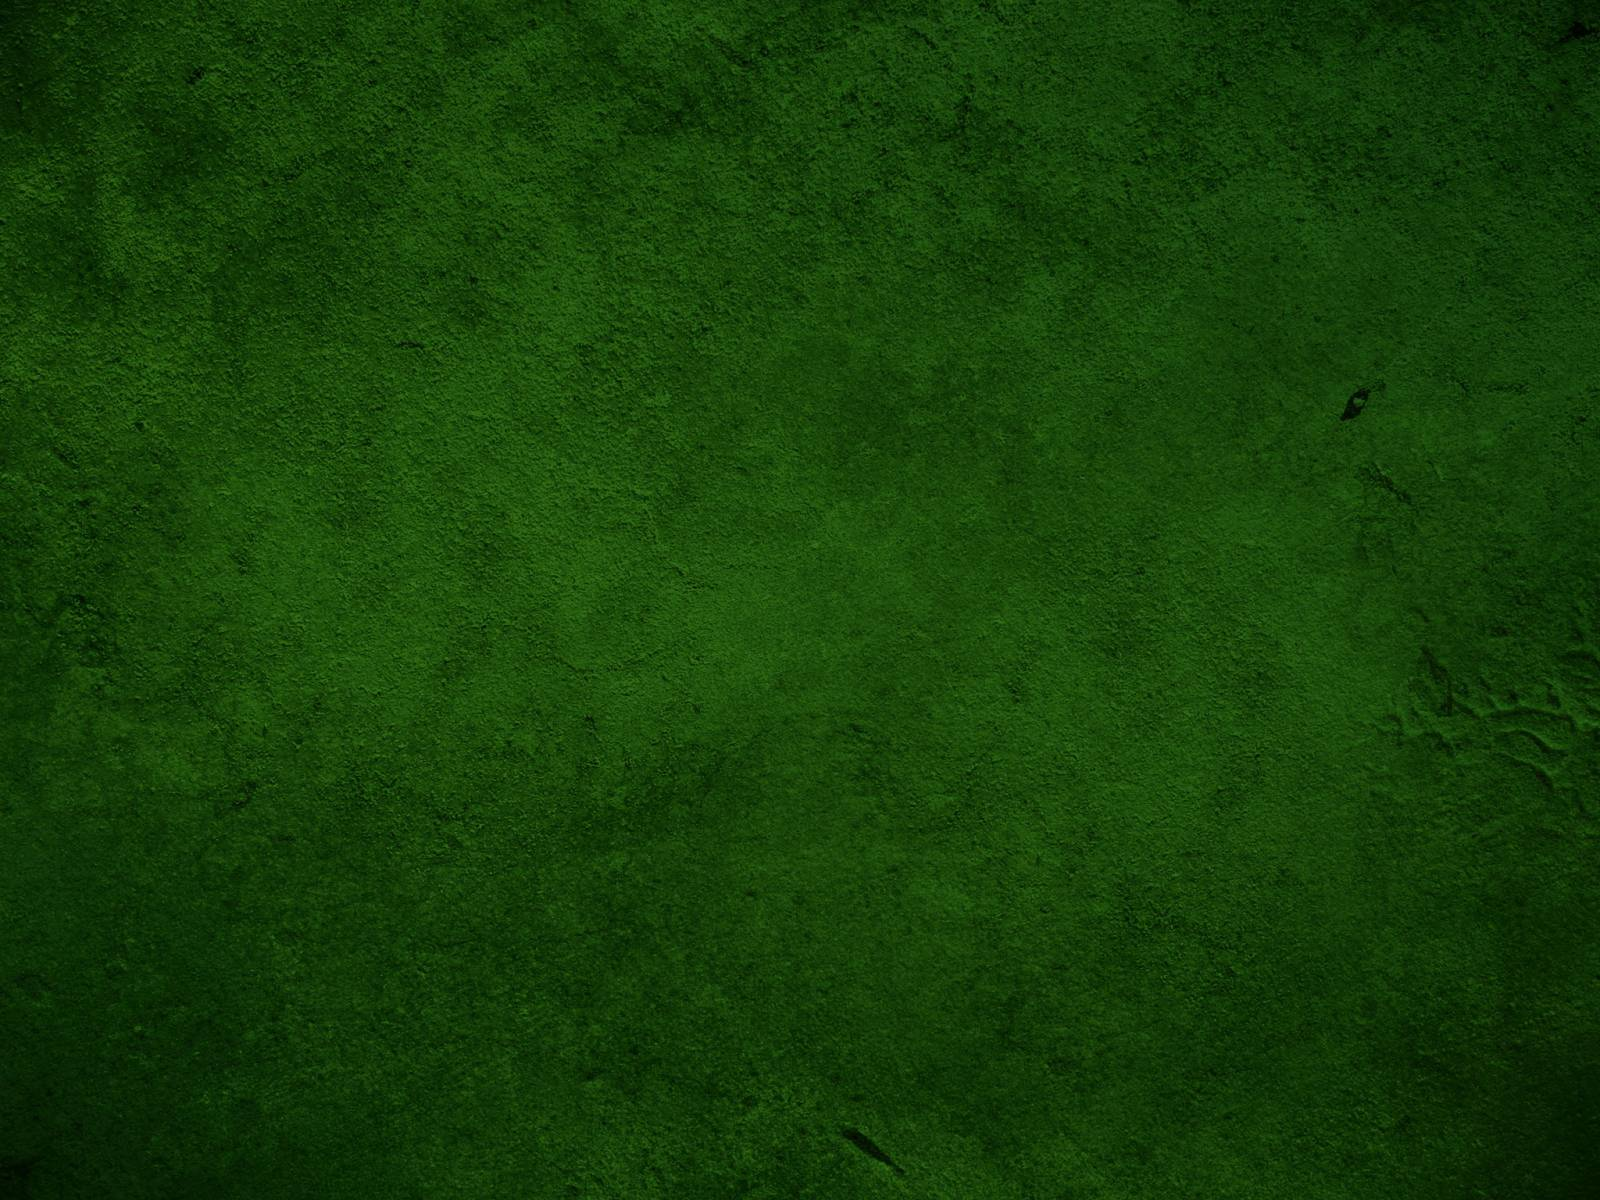 green background e1533026375186